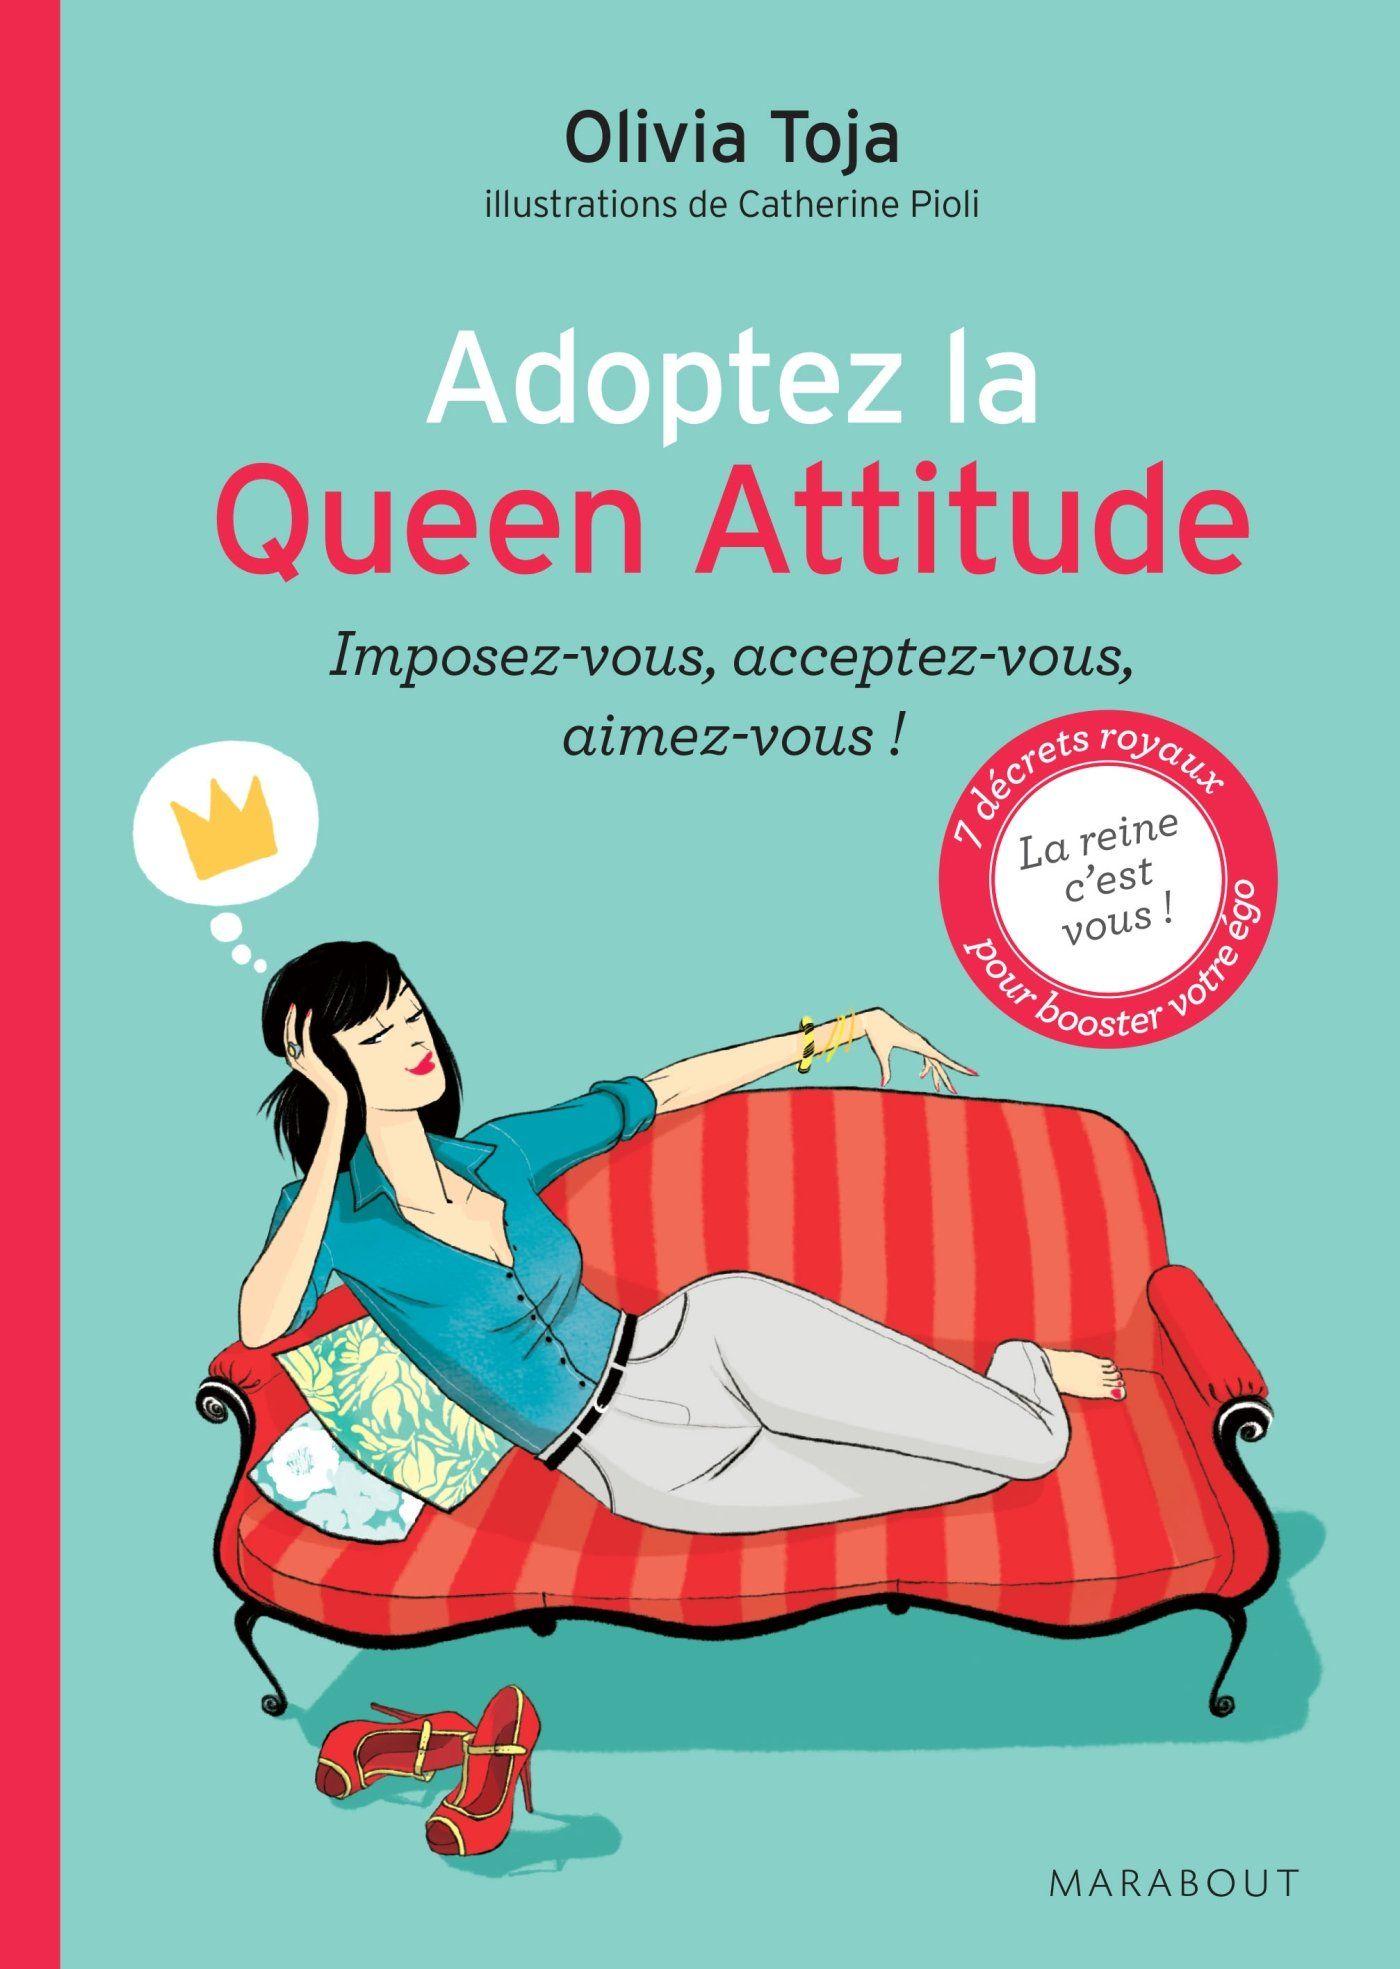 Amazon Fr Adoptez La Queen Attitude Olivia Toja Livres Téléchargement Queen Attitude